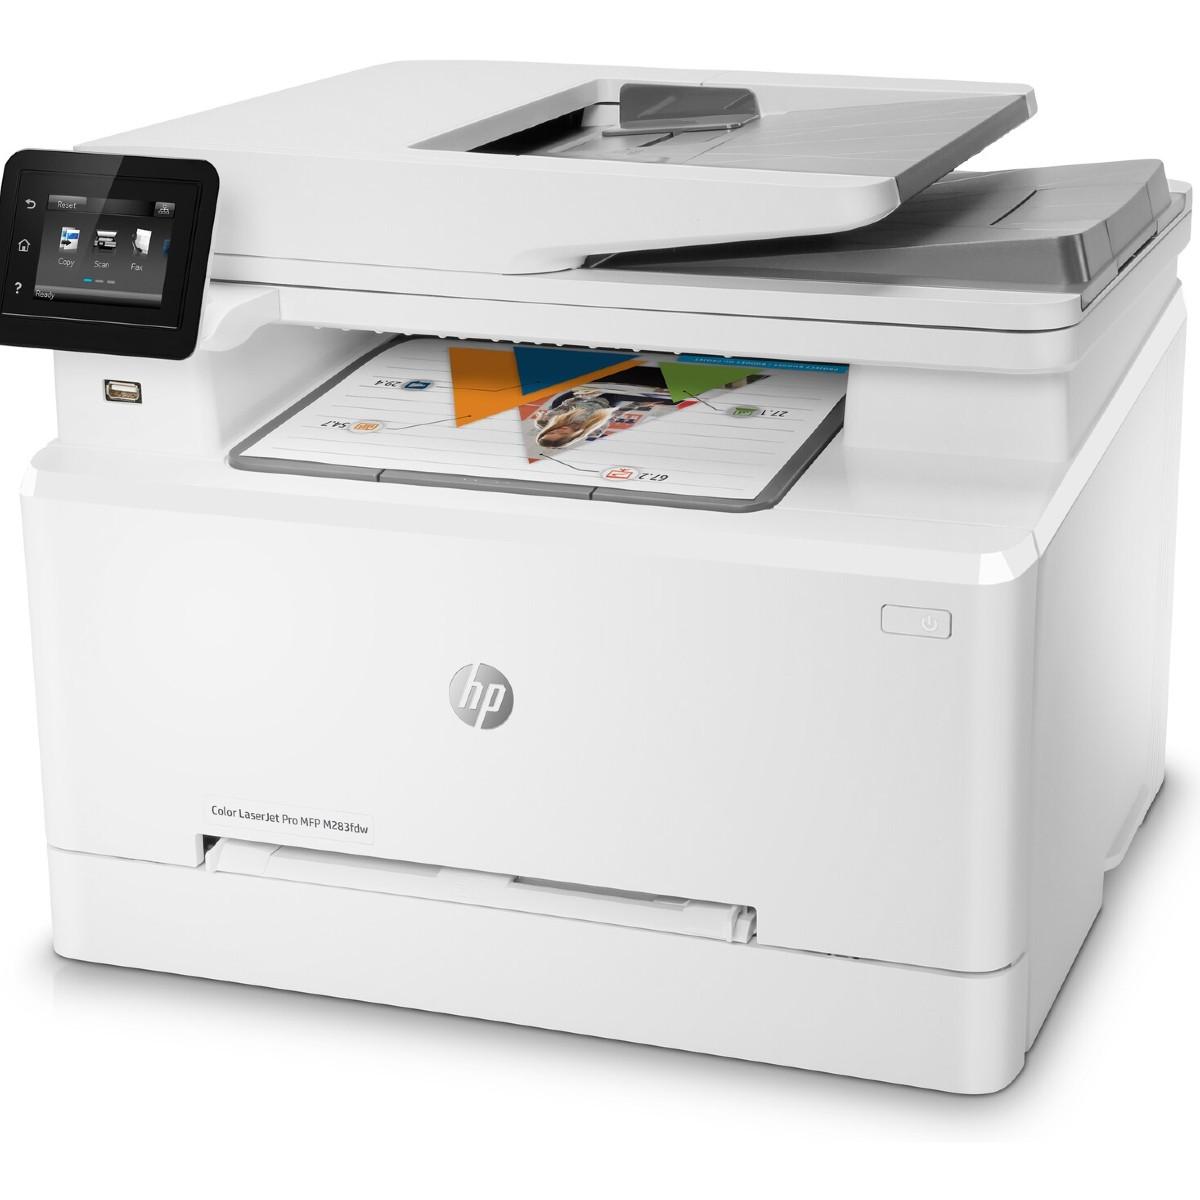 HP Color LaserJet Pro M283fdw מדפסת לייזר